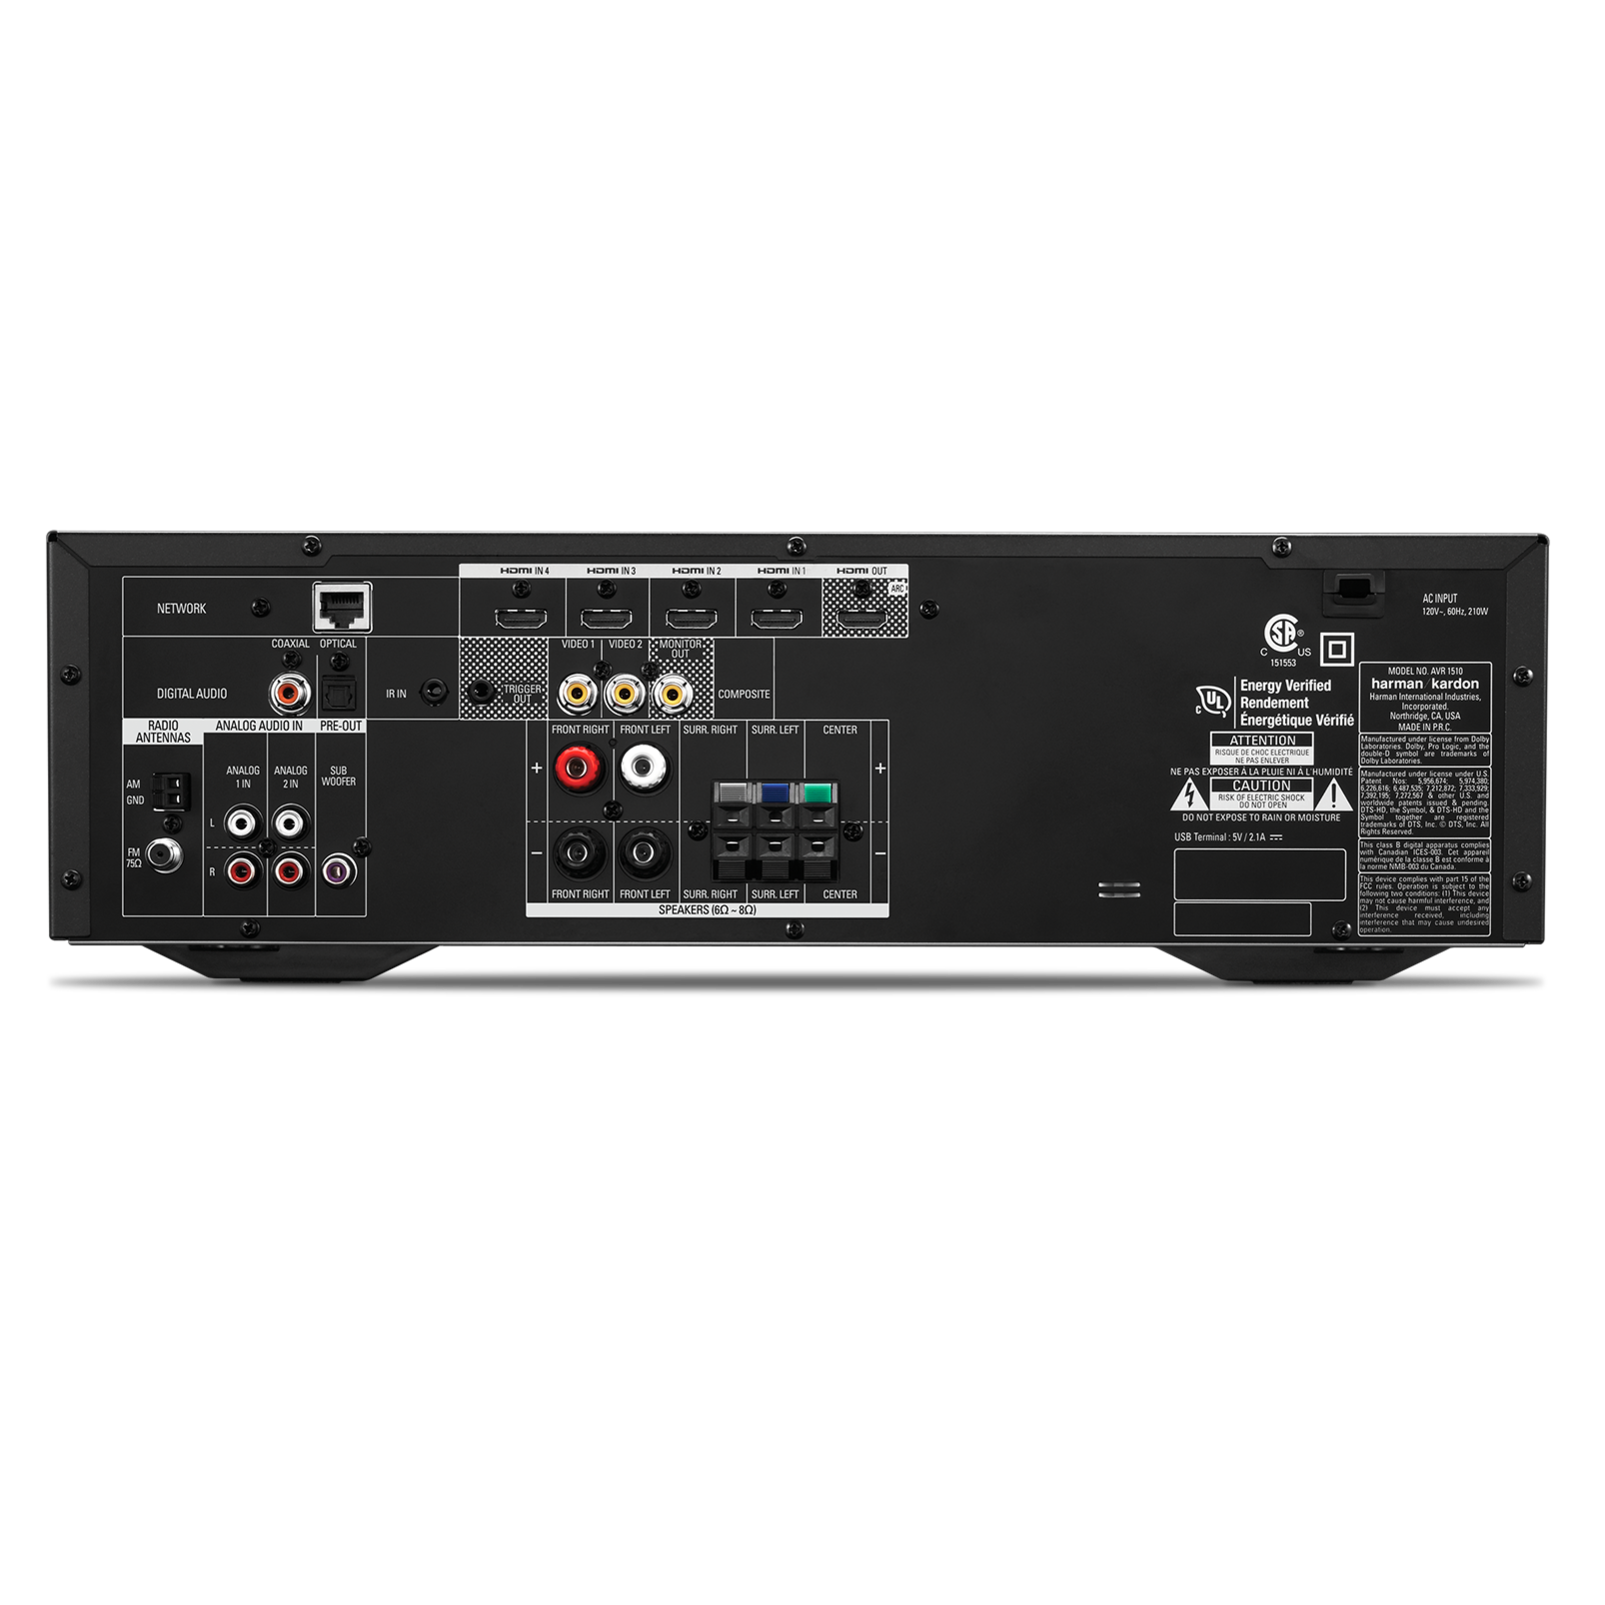 AVR 1510